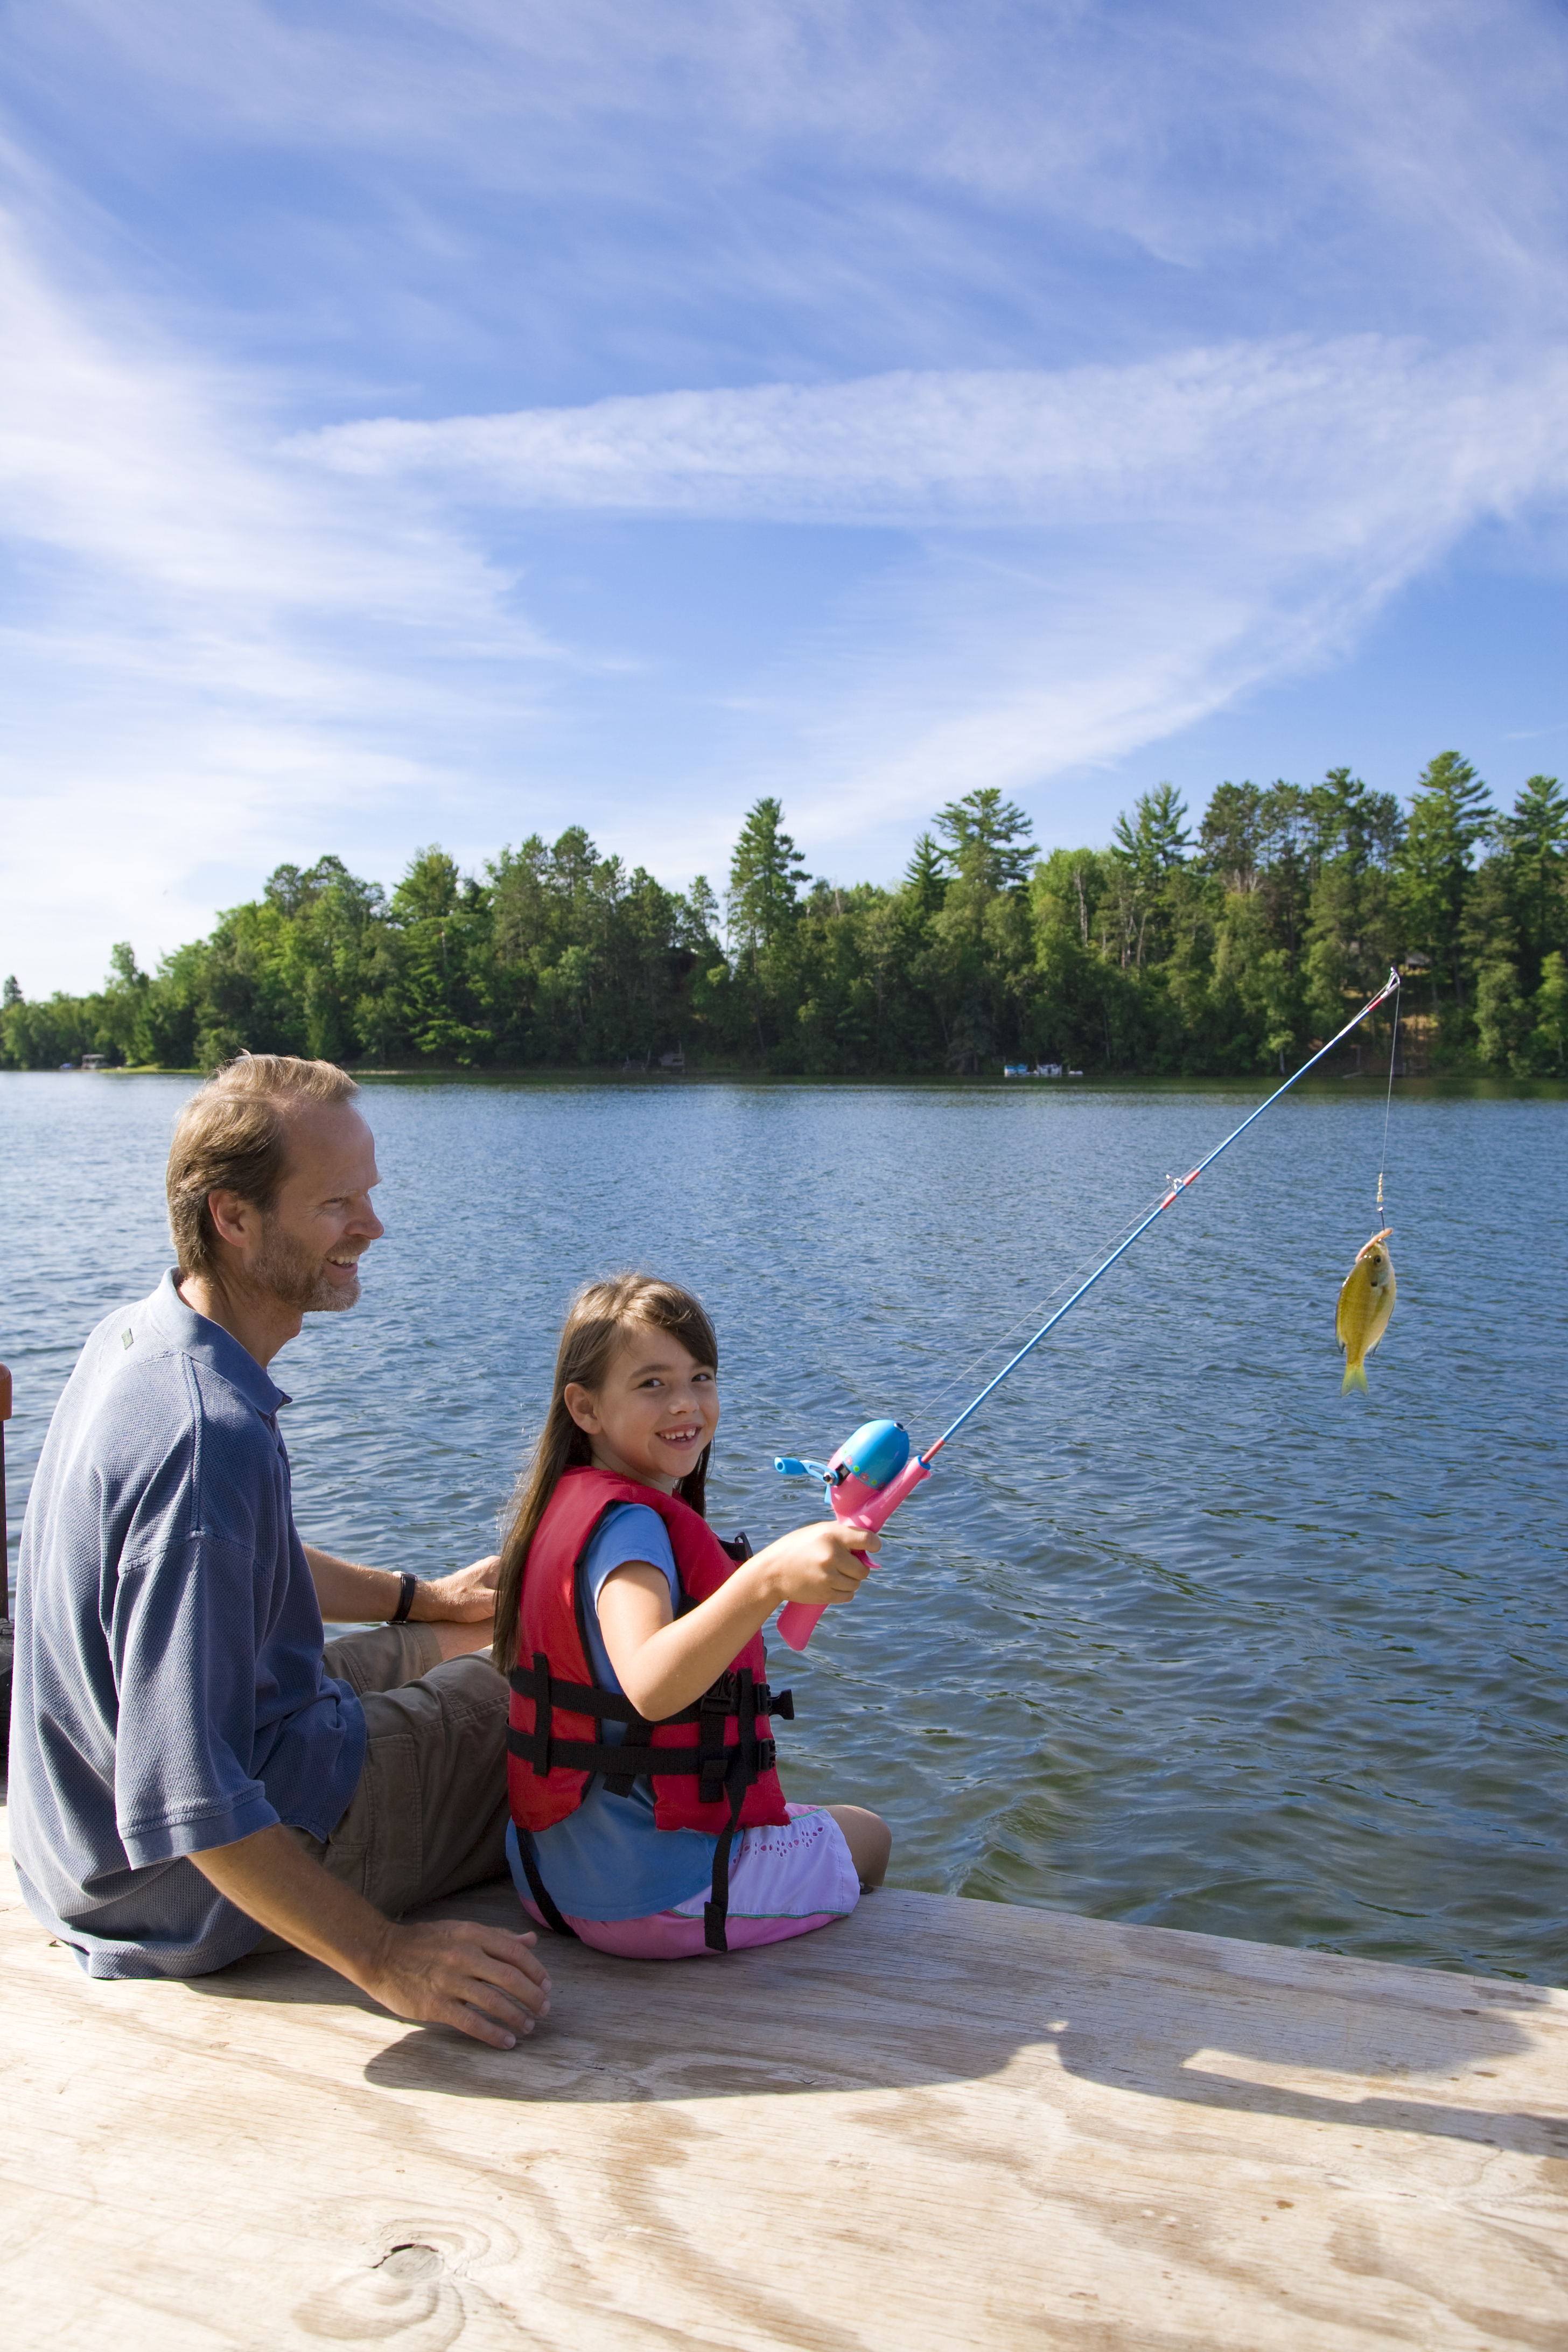 Minnesota DNR takes aim at the outdoor skills gap